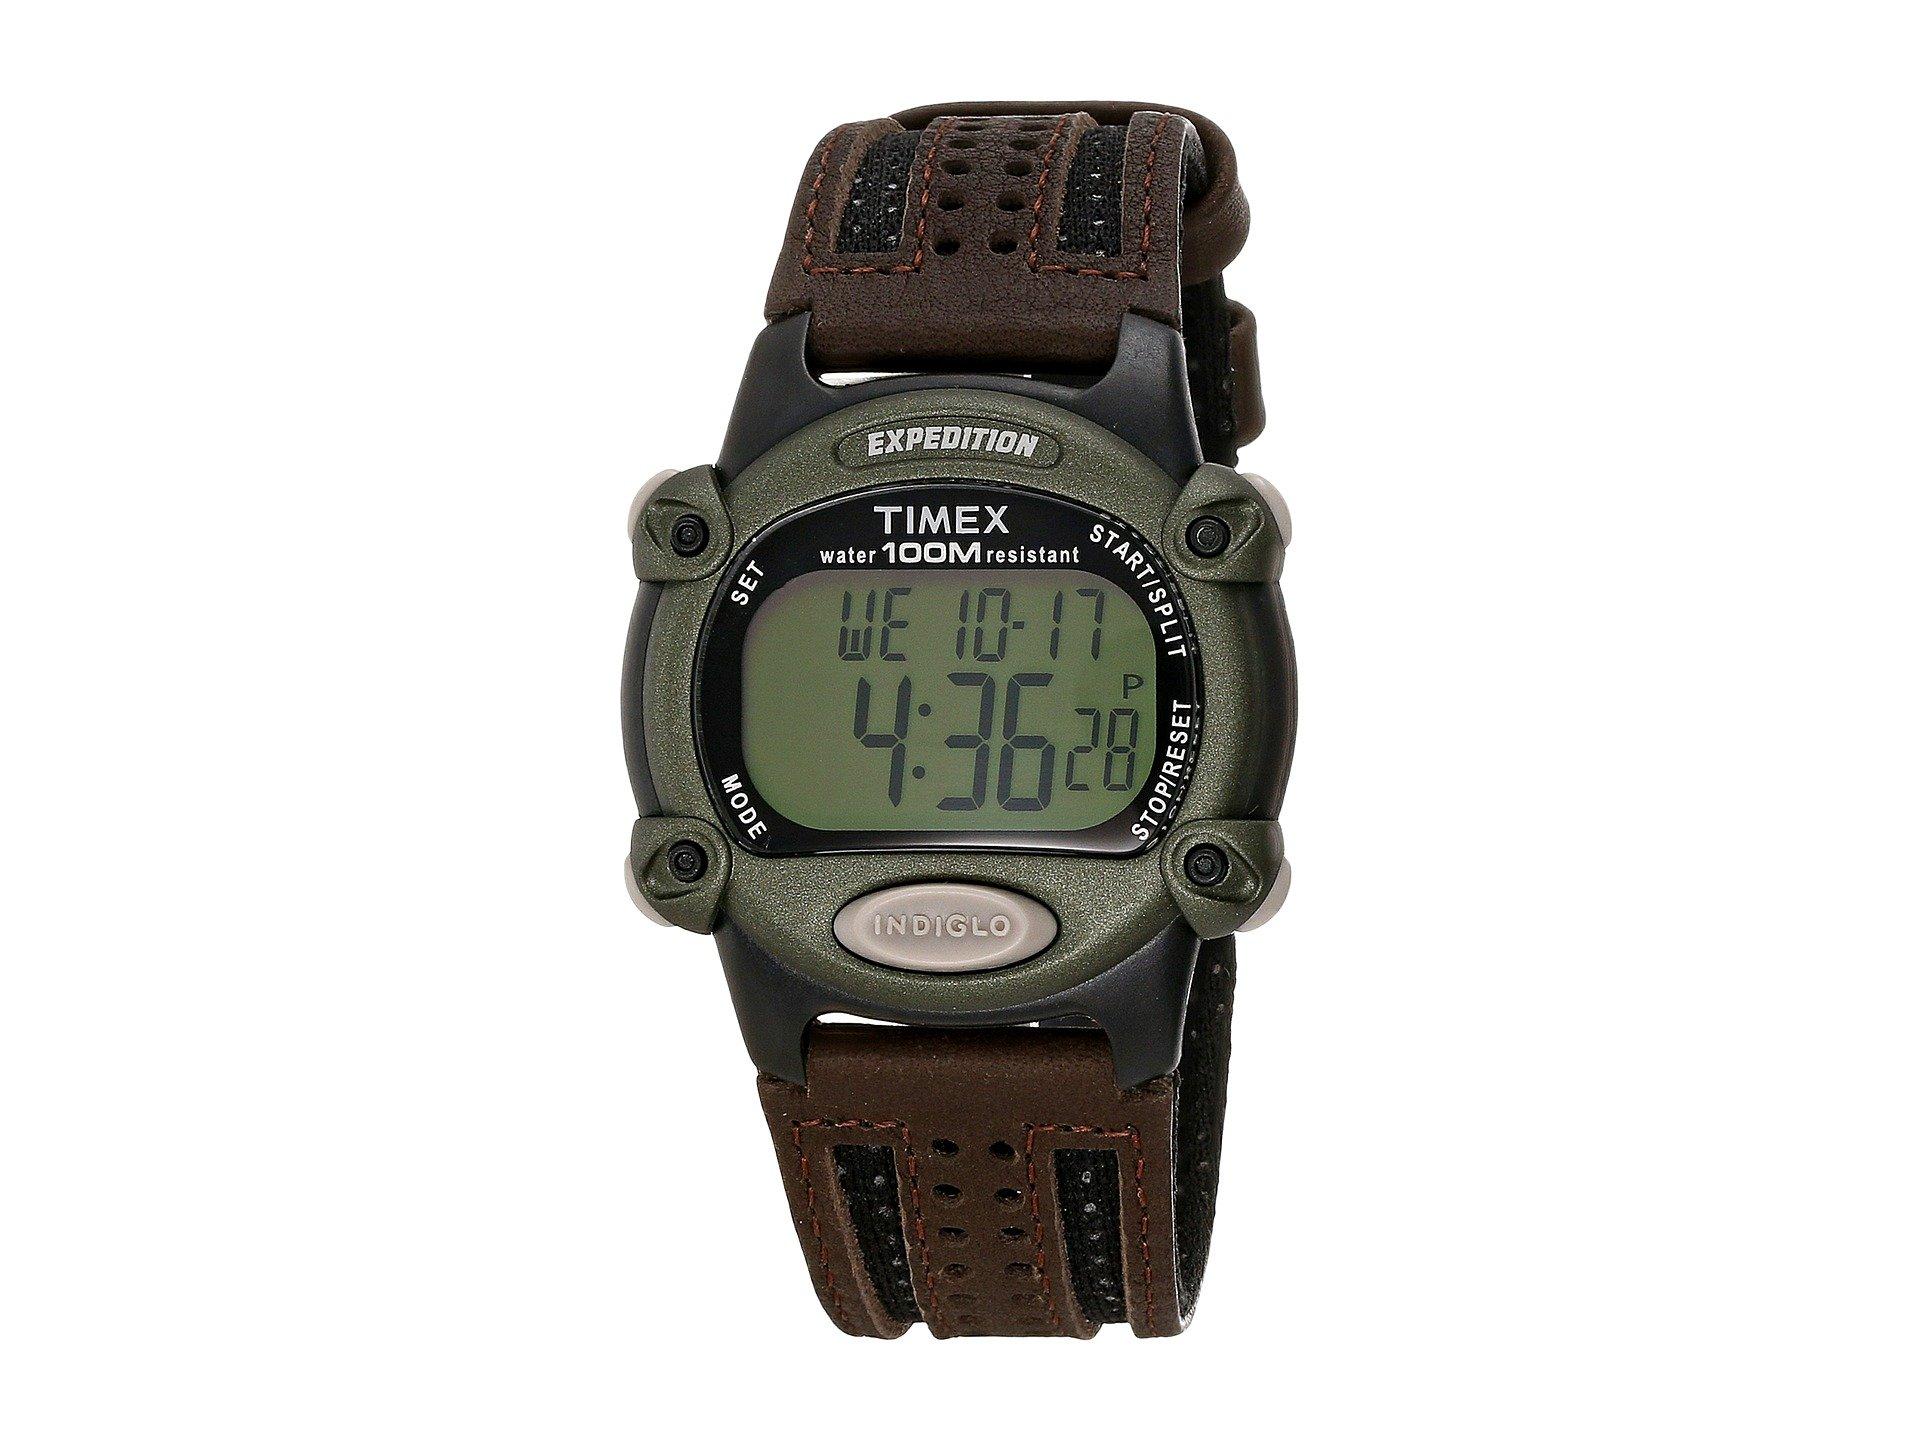 Reloj para Hombre Timex Expedition Chrono Alarm Timer Full  + Timex en VeoyCompro.net